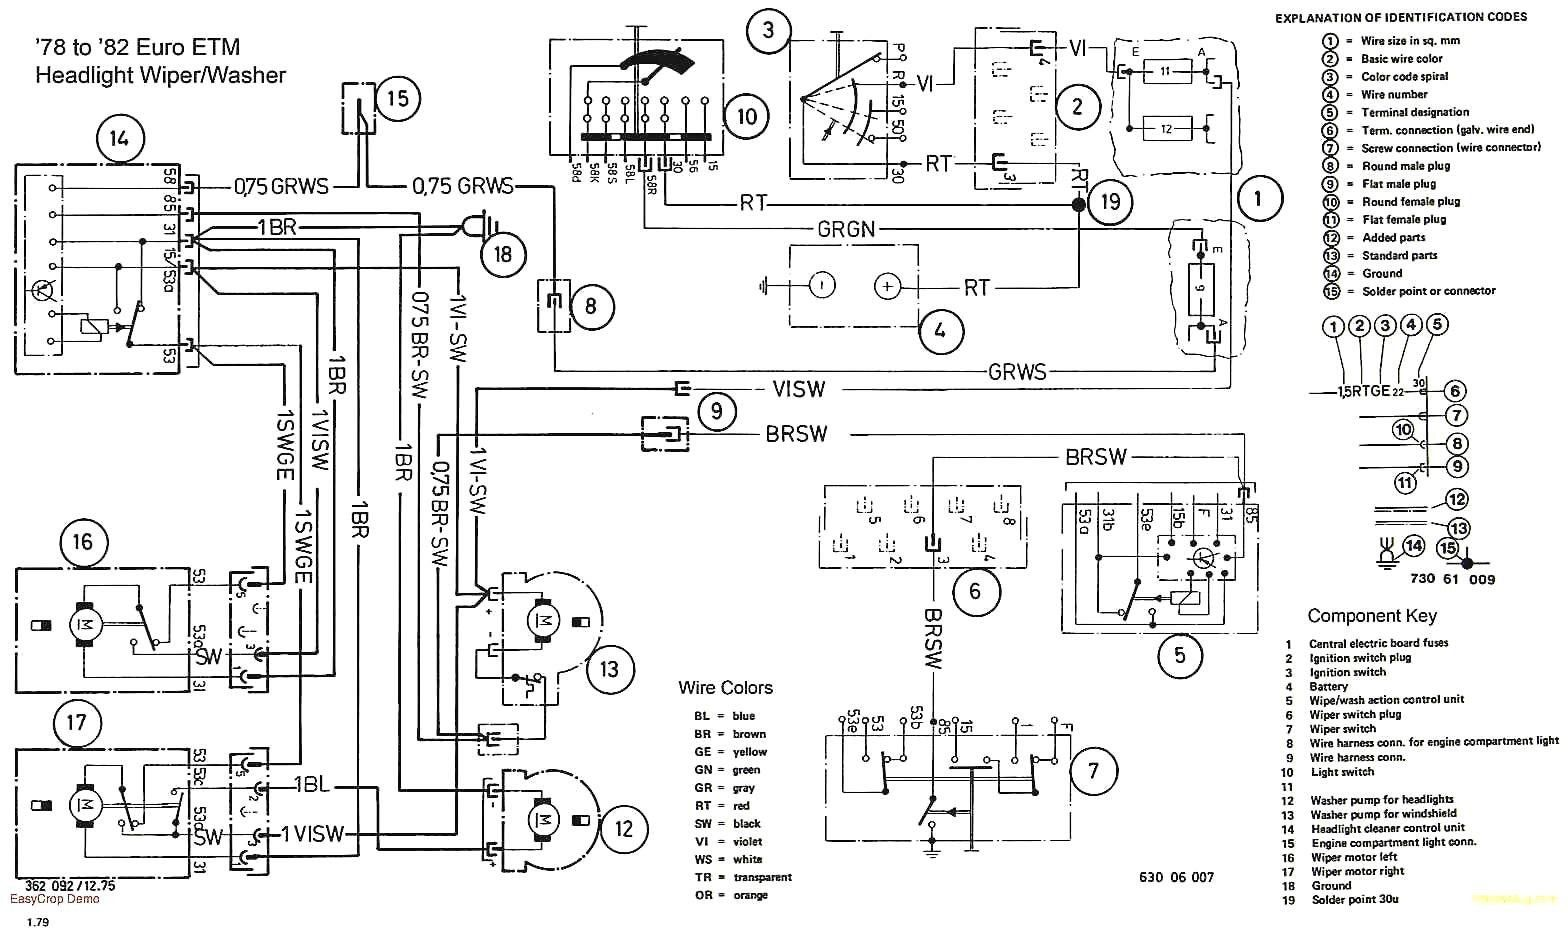 Bmw Planet Wiring Old Cub Cadet Rear End Diagram On A Wire Bege Wiring Diagram